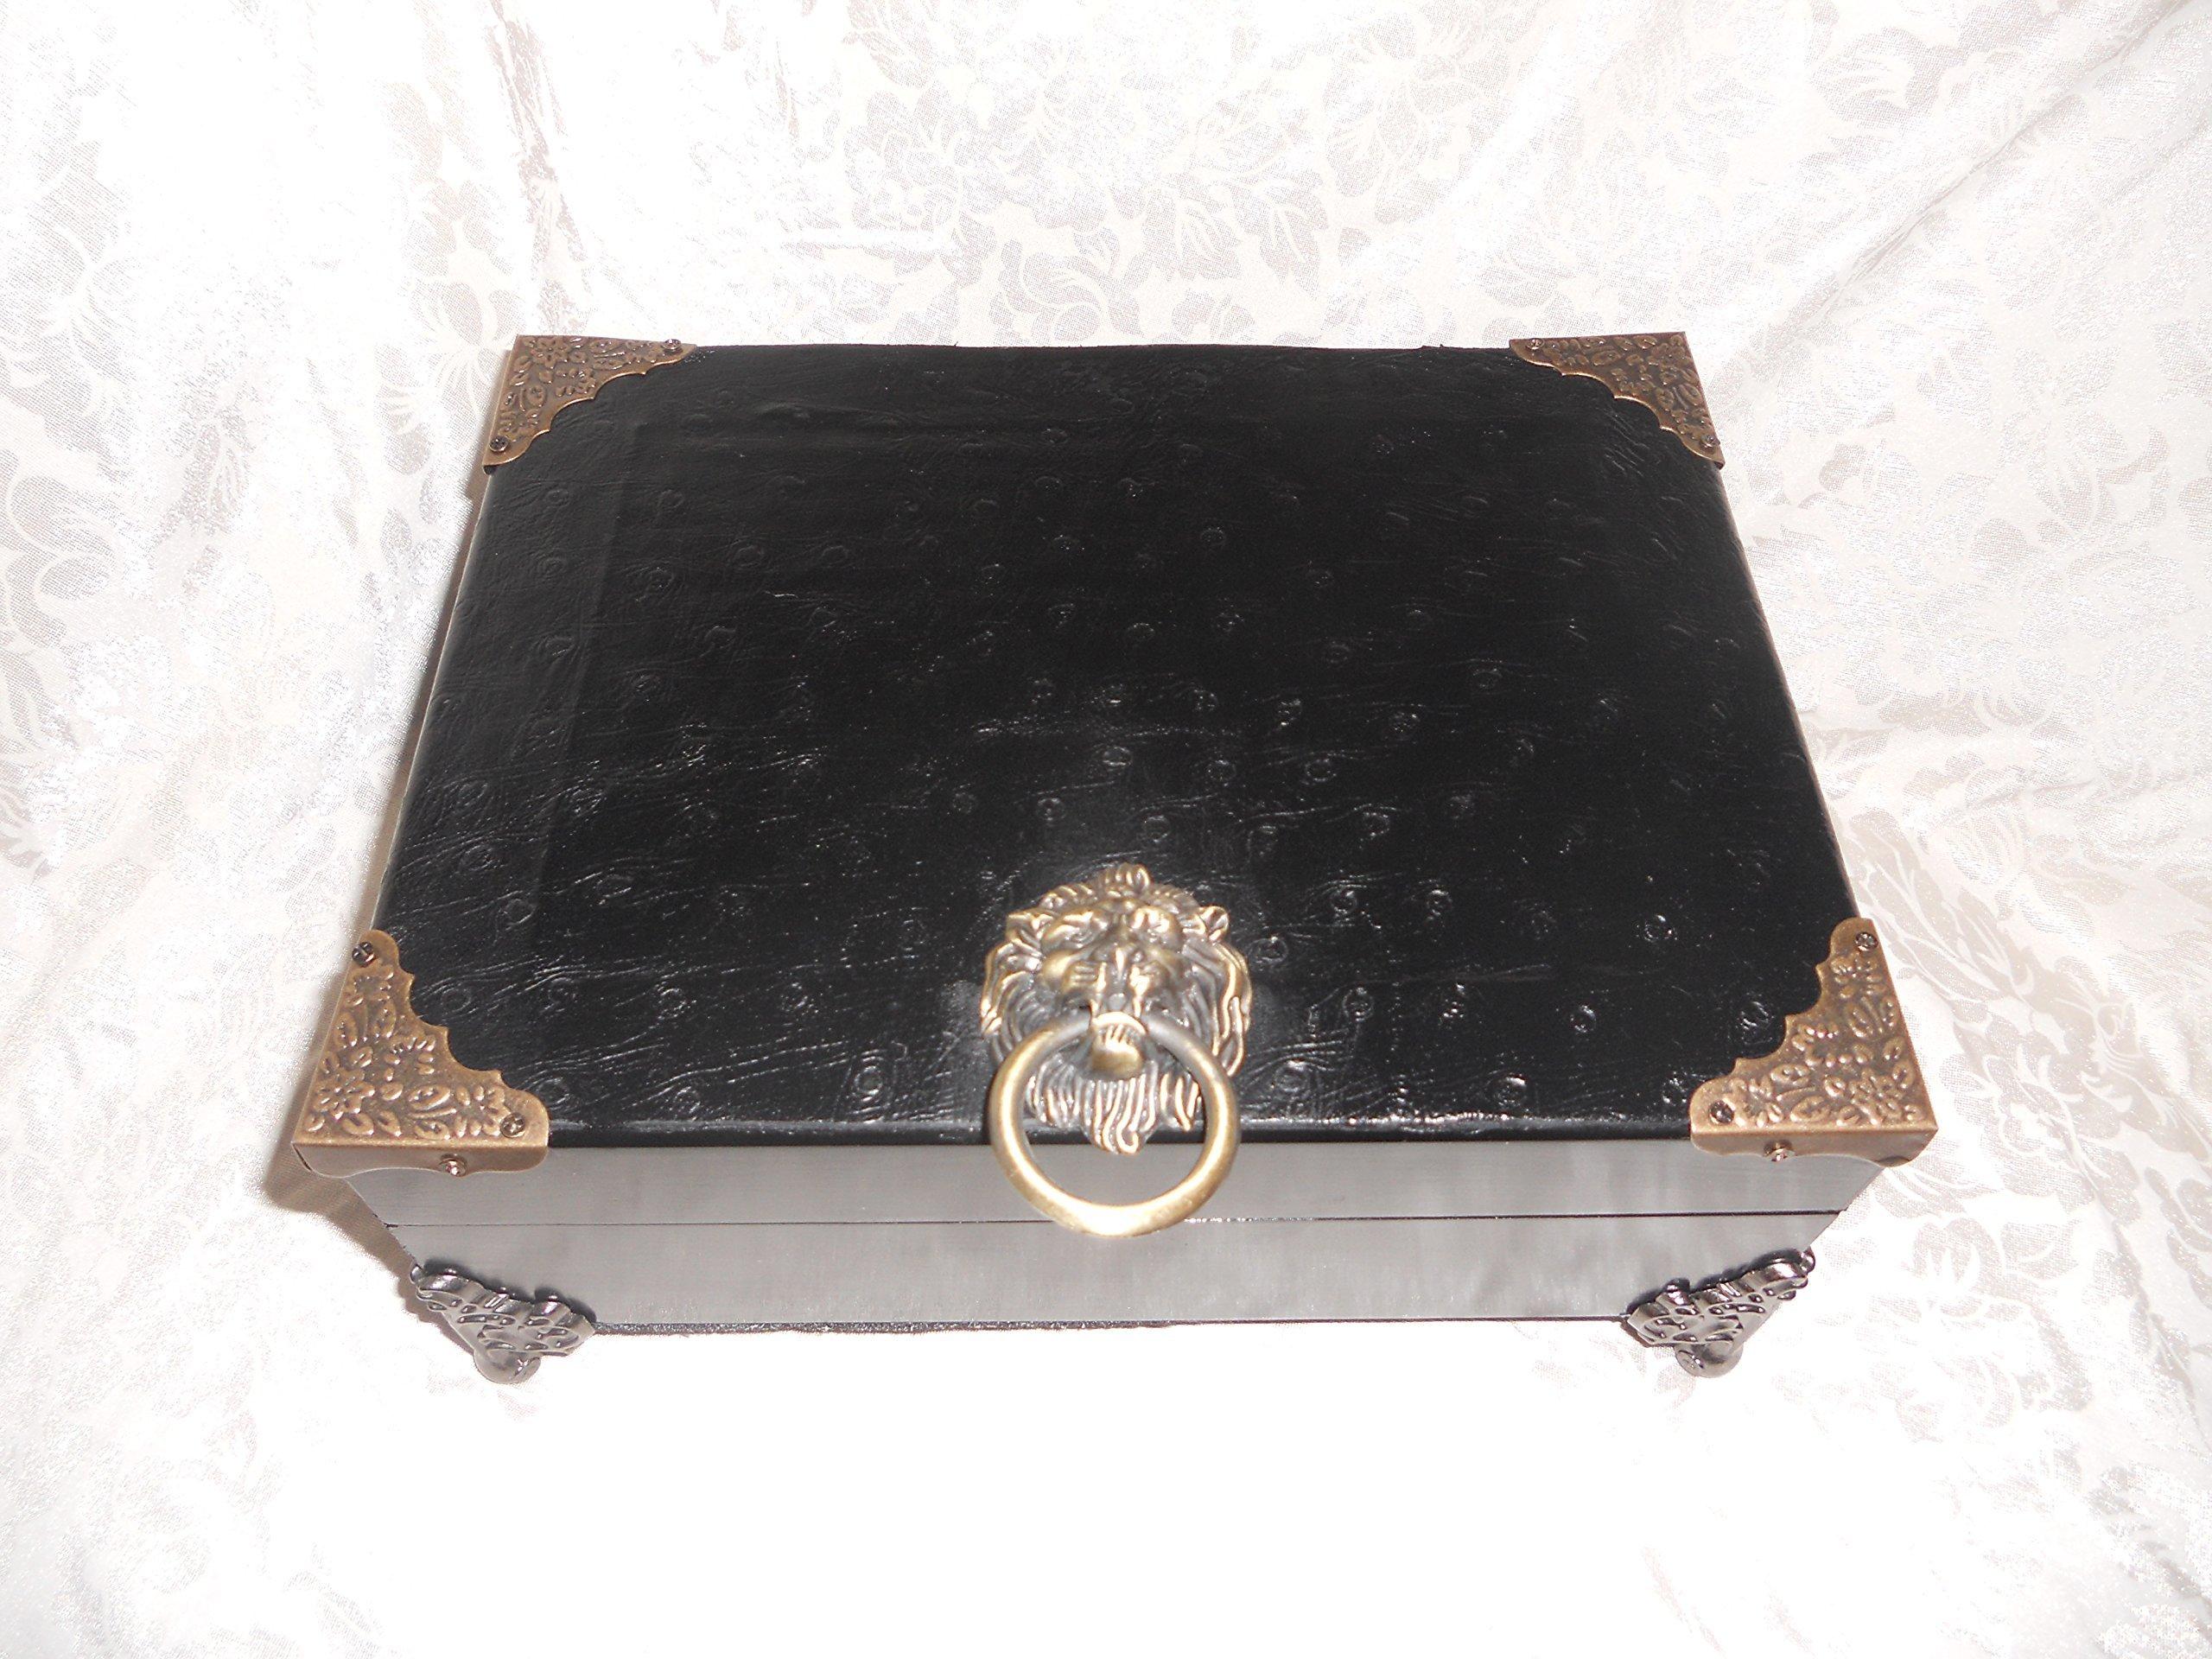 Mens Jewelry Box, Custom Box Valet, Black Ostrich Leather, Valuable Box, Personal Box, Organizing box, Leather